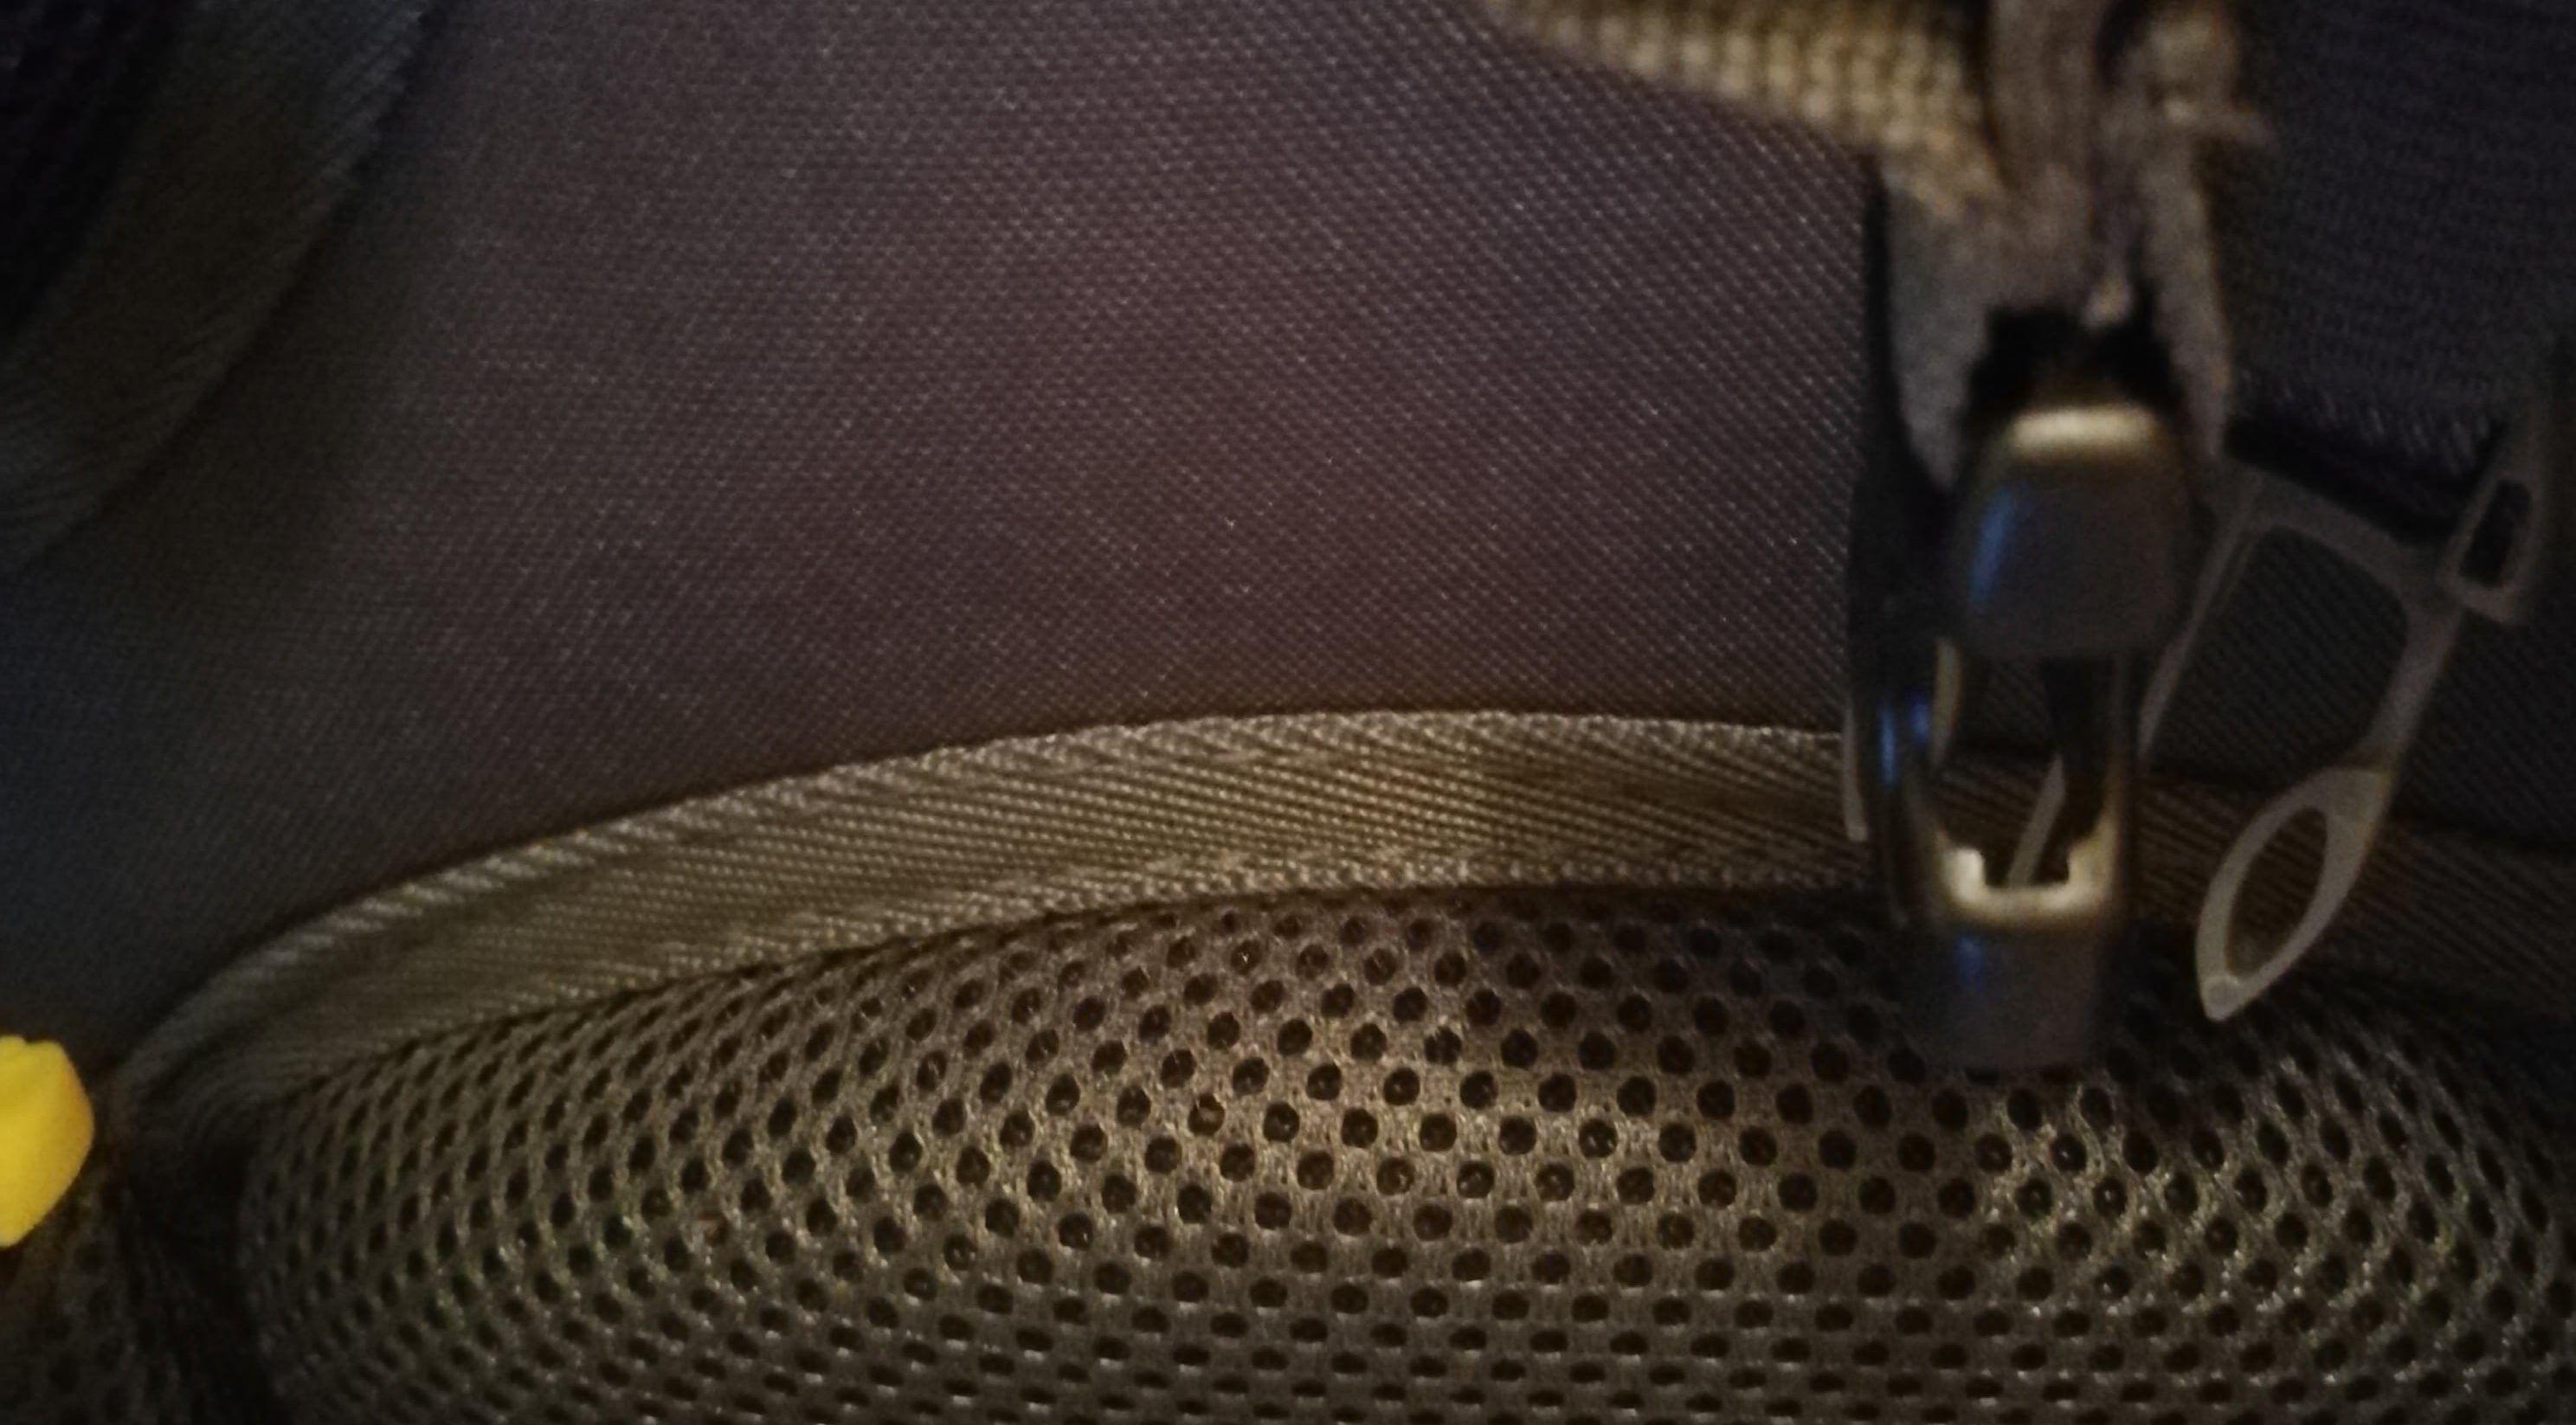 La mochila perfecta - Haz La Mochila